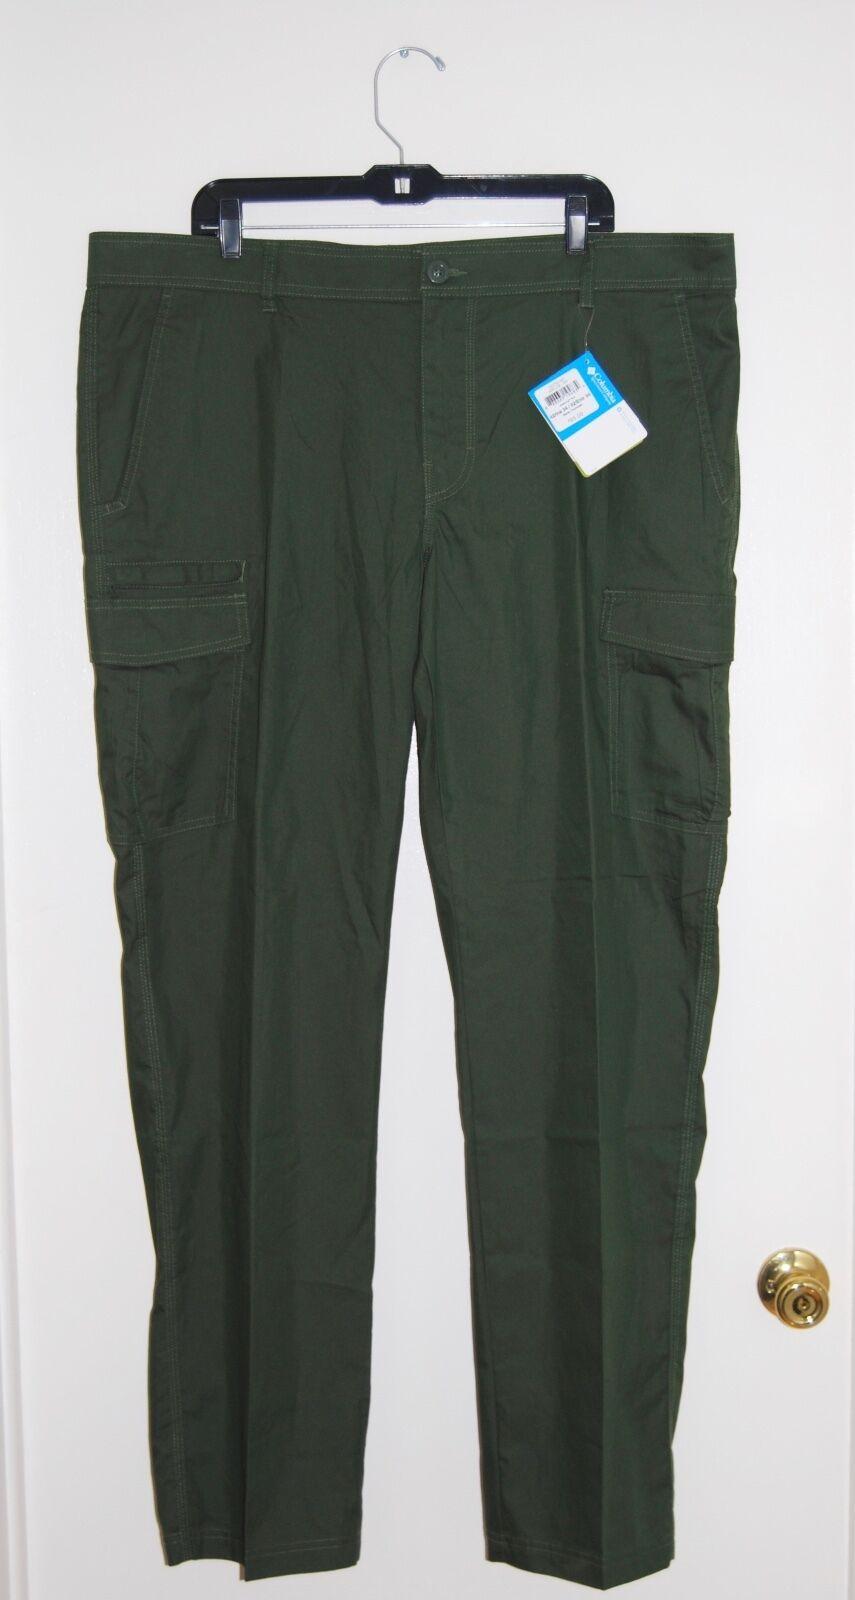 NWT Columbia Men's Dark Green Flat Front Jetsetting Cargo Pants, 42 W x 34  L